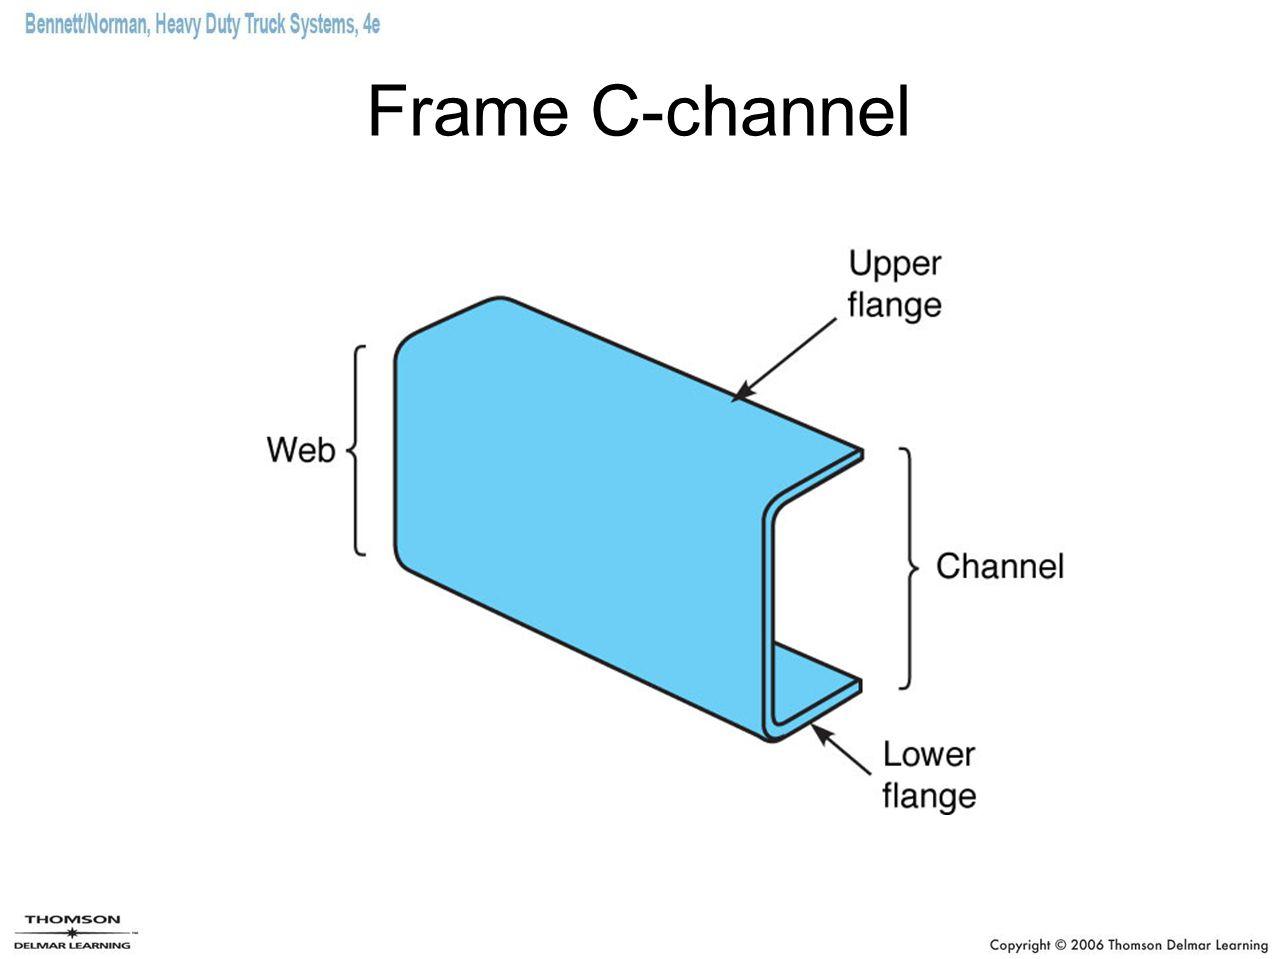 Frame C-channel